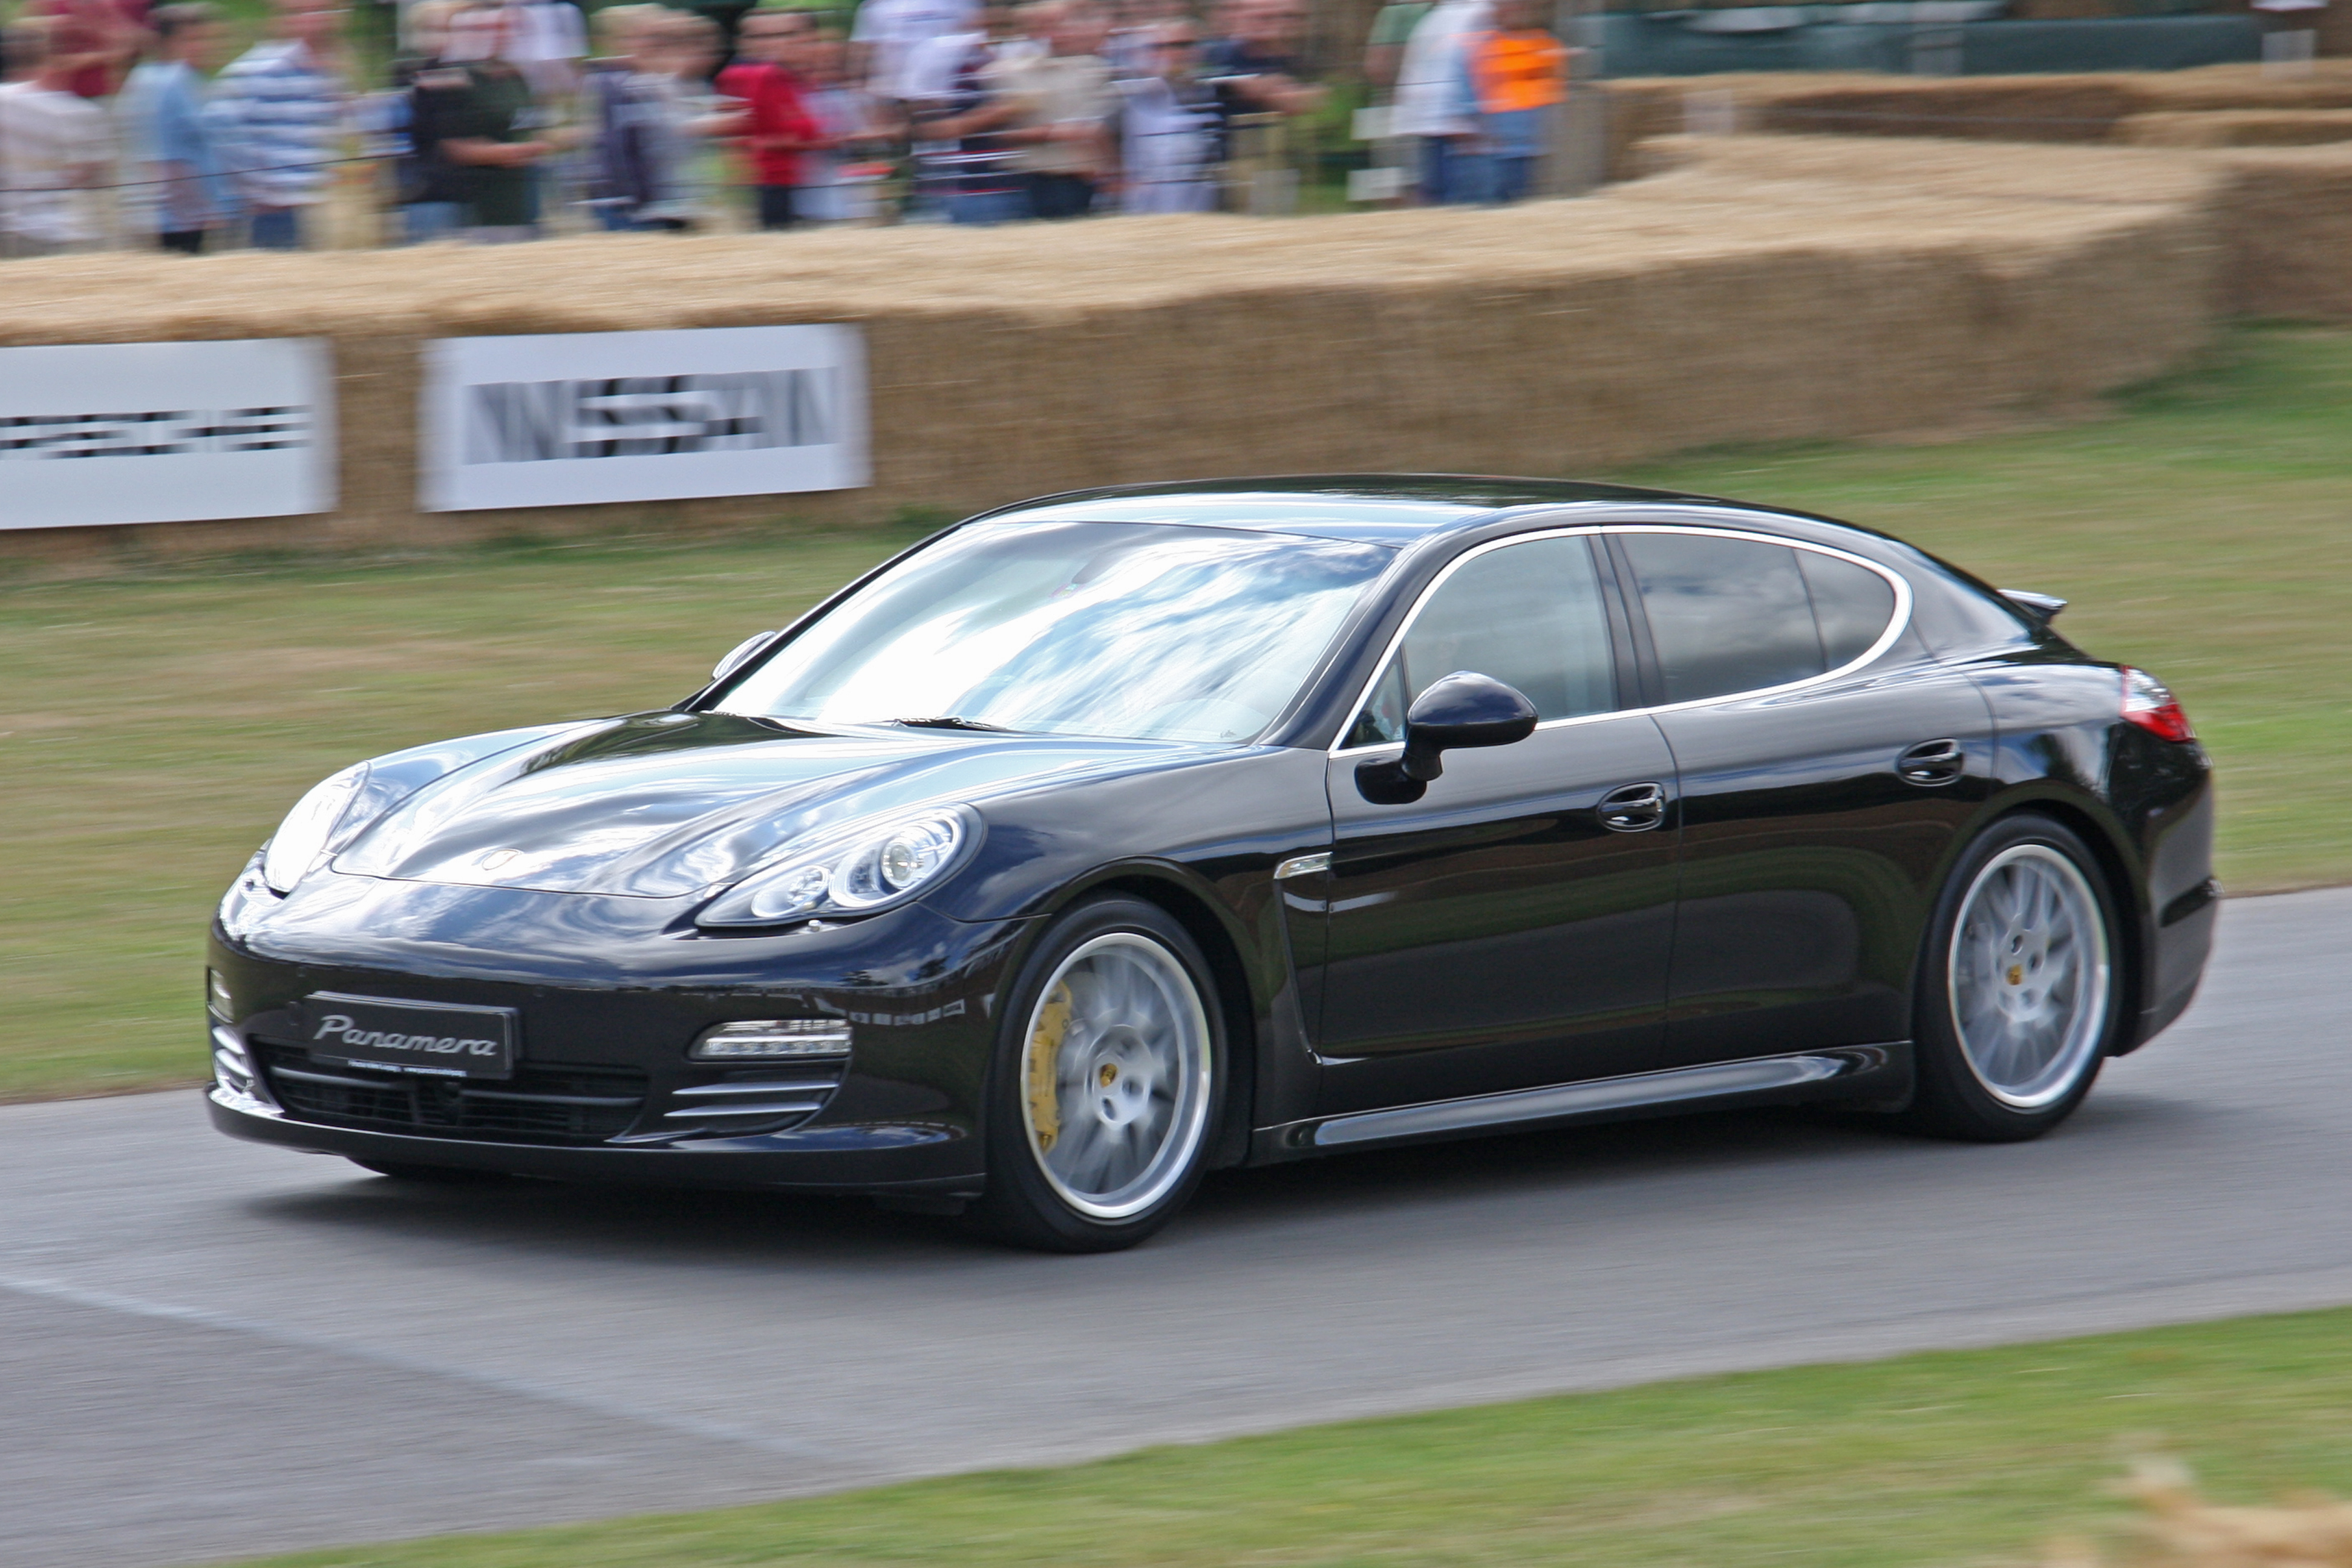 File:Porsche Panamera 4S.jpg - Wikimedia Commons